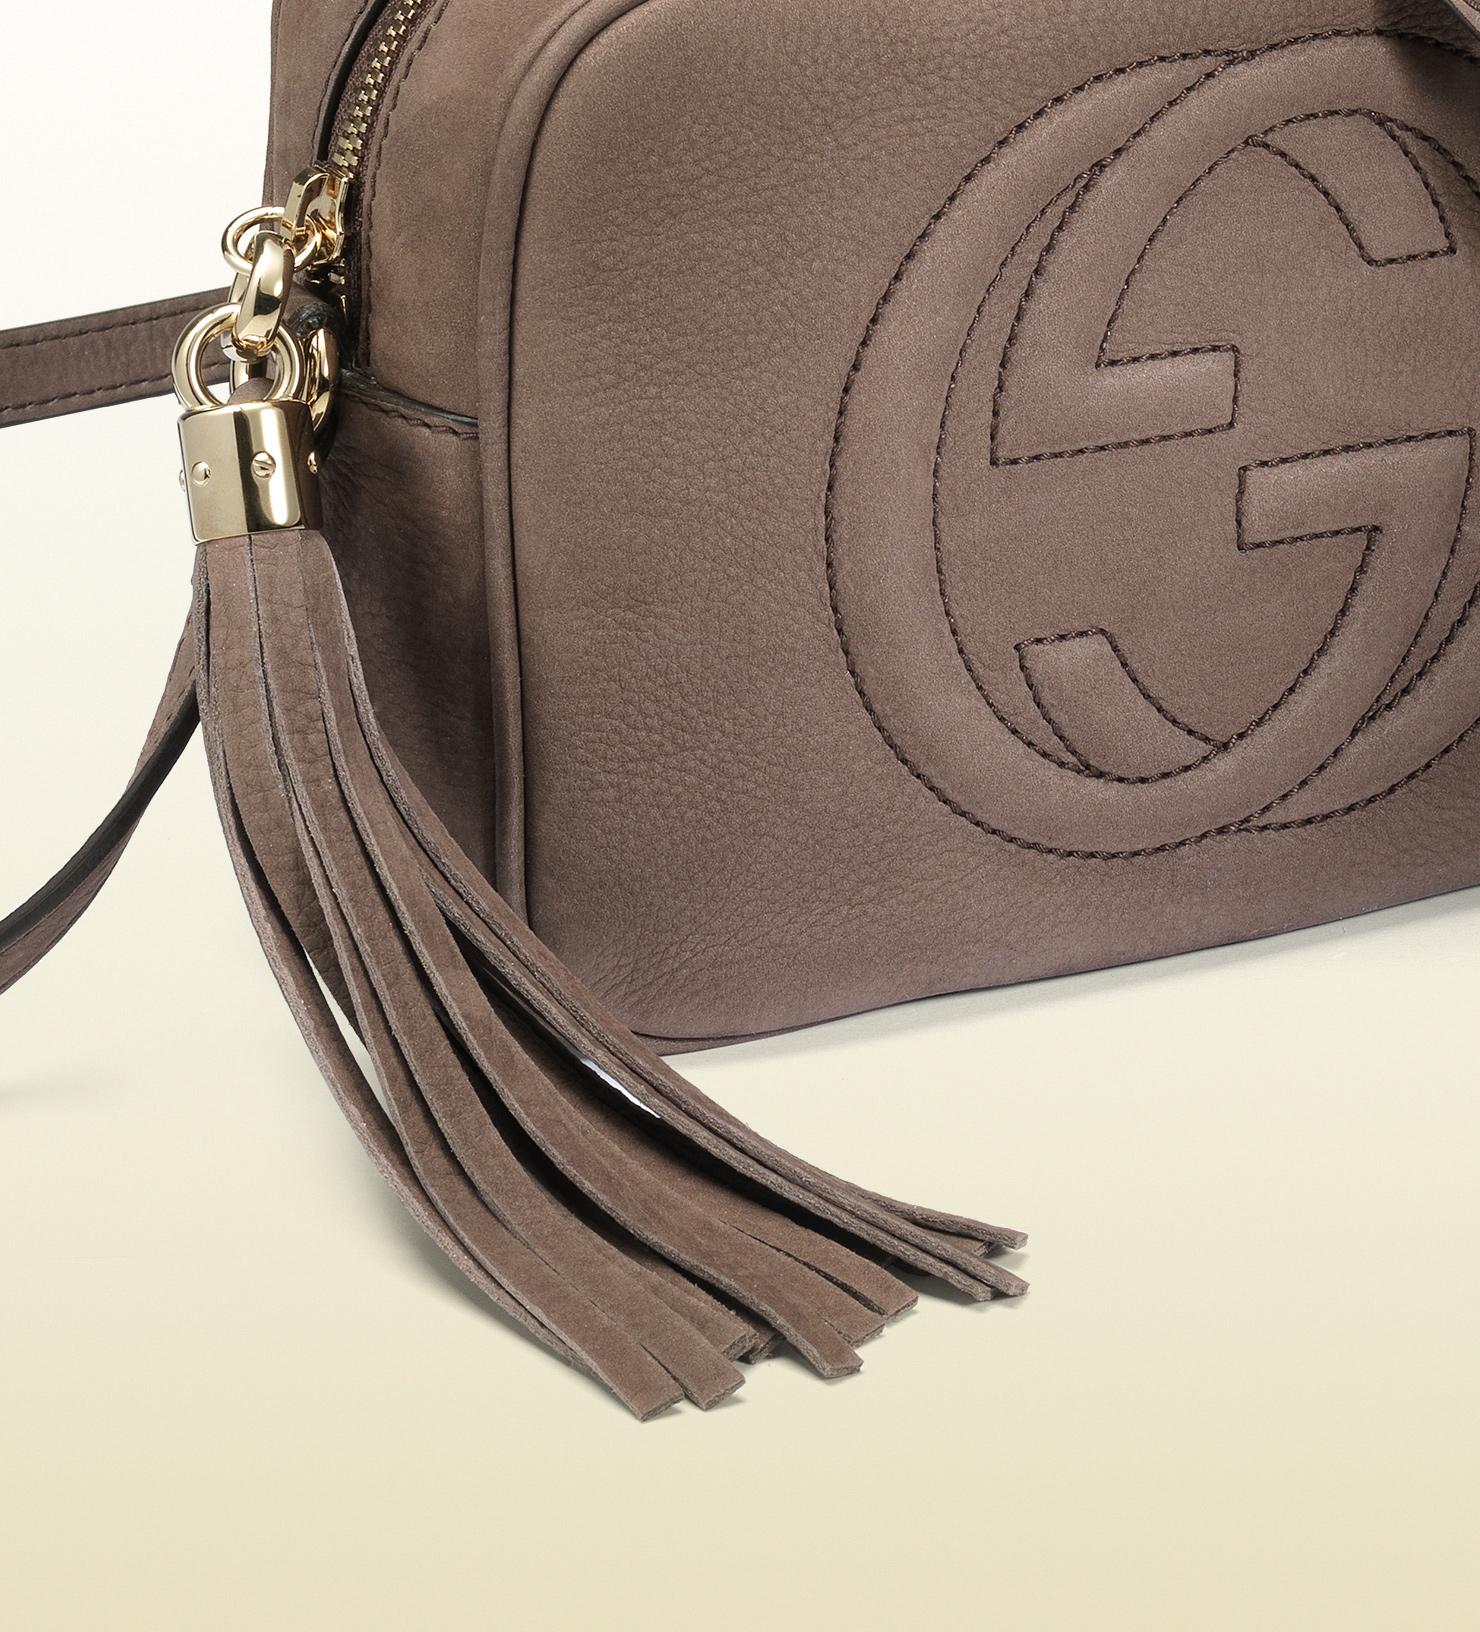 b222e49b7a2 Lyst - Gucci Soho Nubuck Leather Disco Bag in Gray